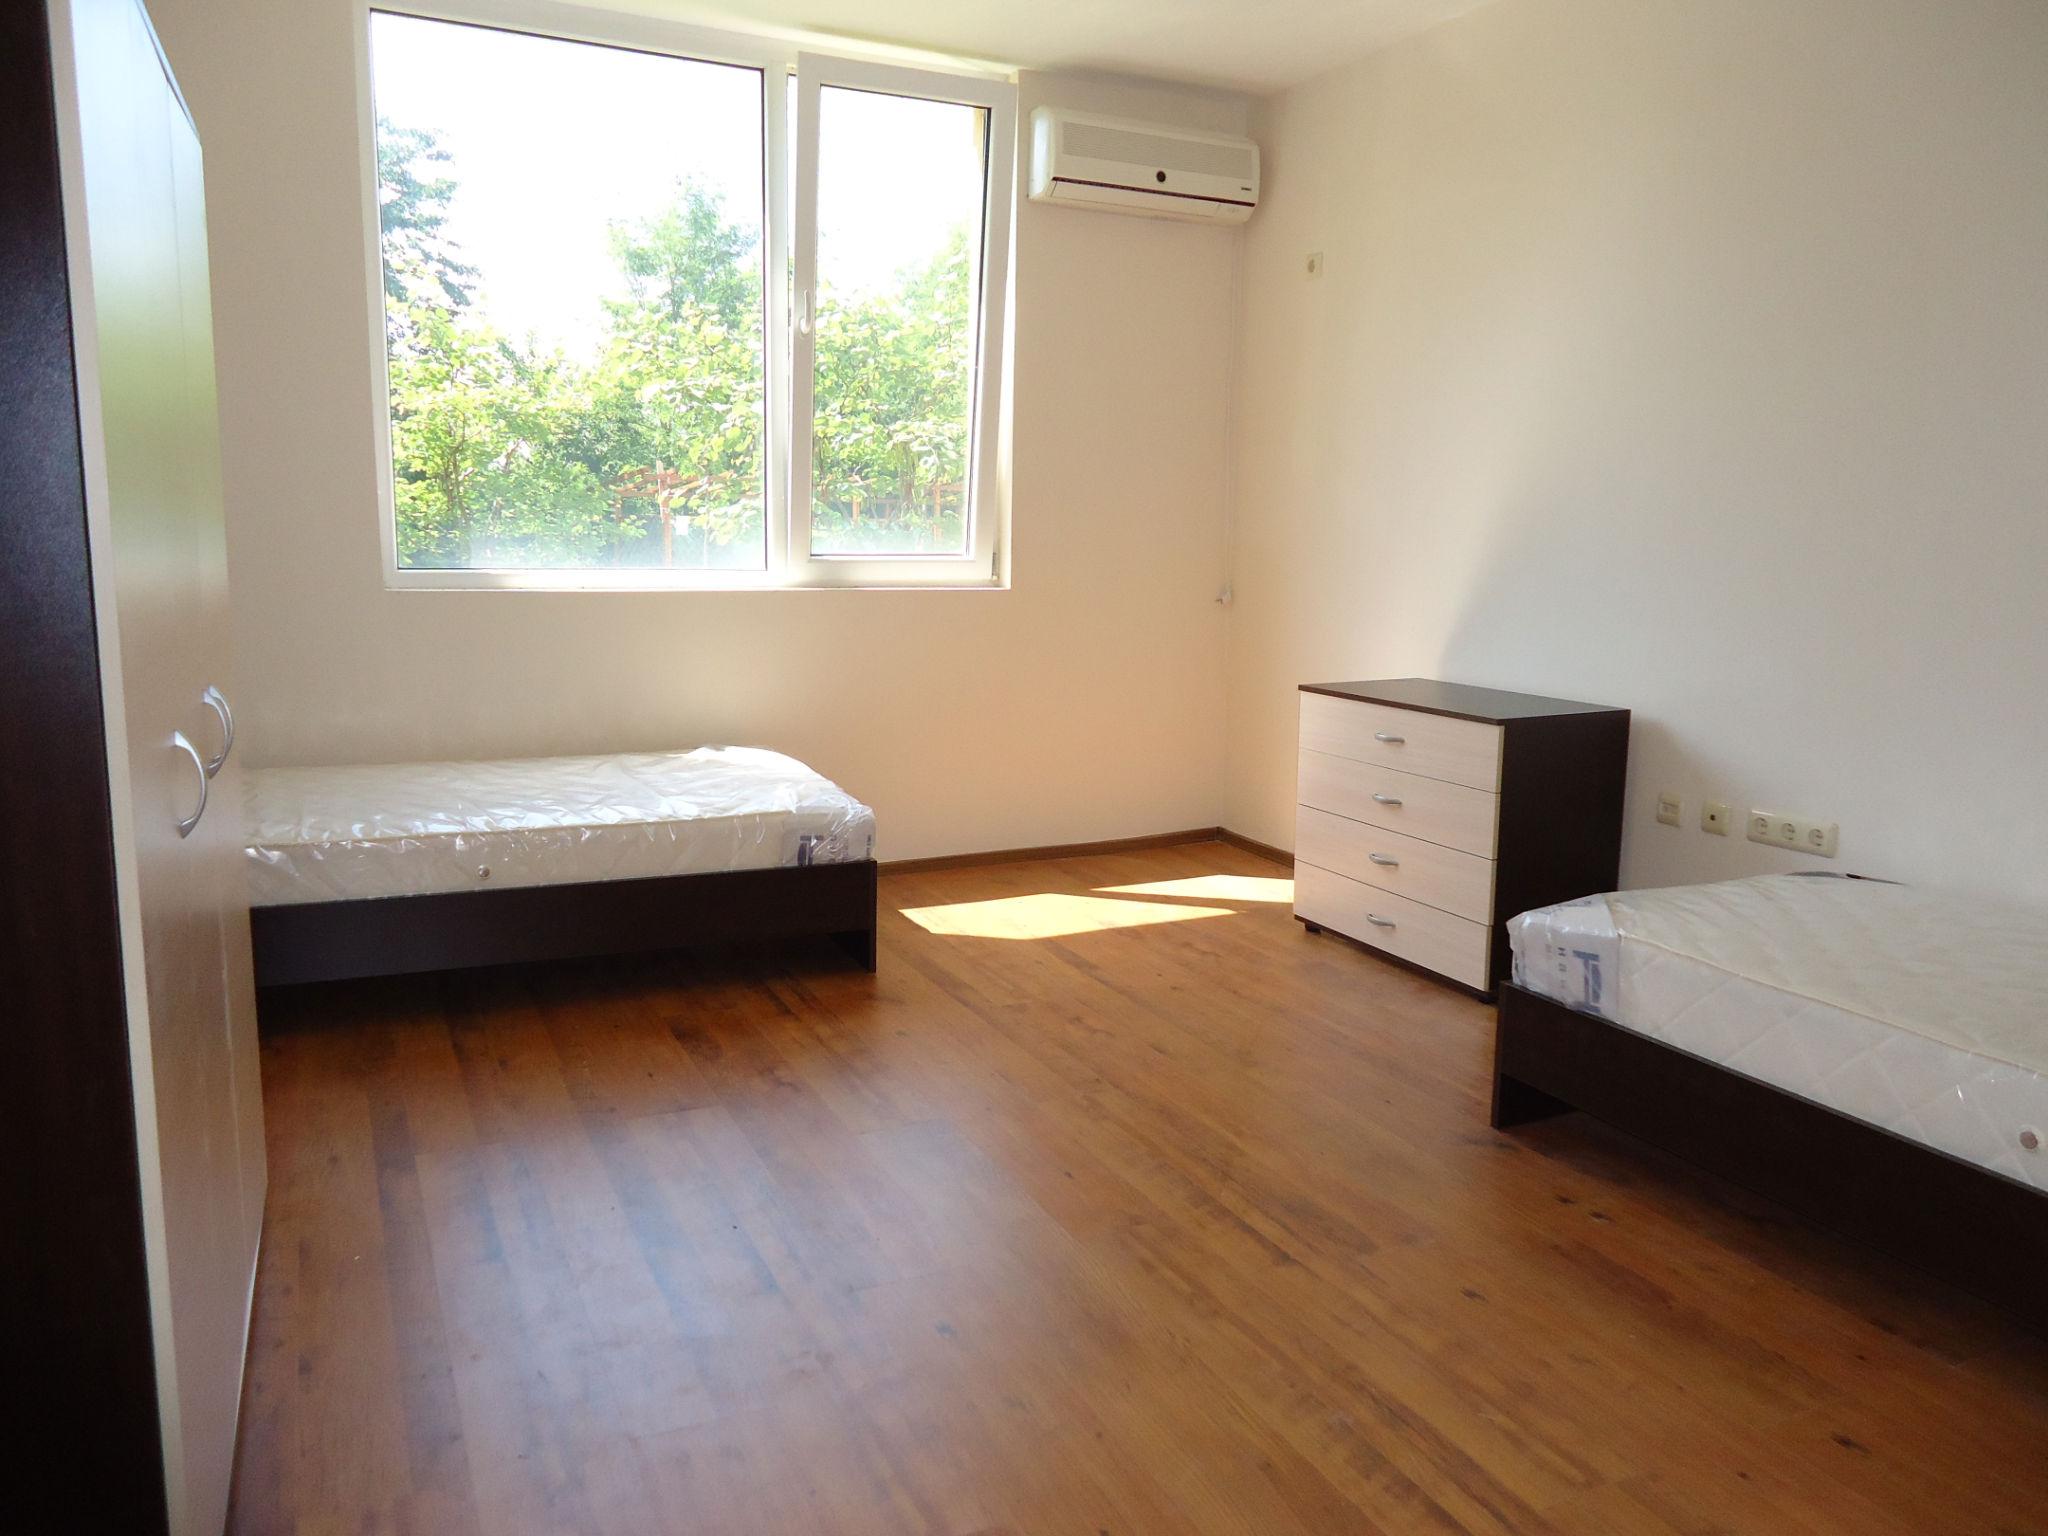 1608640310-sell-property-dsc04589.JPG